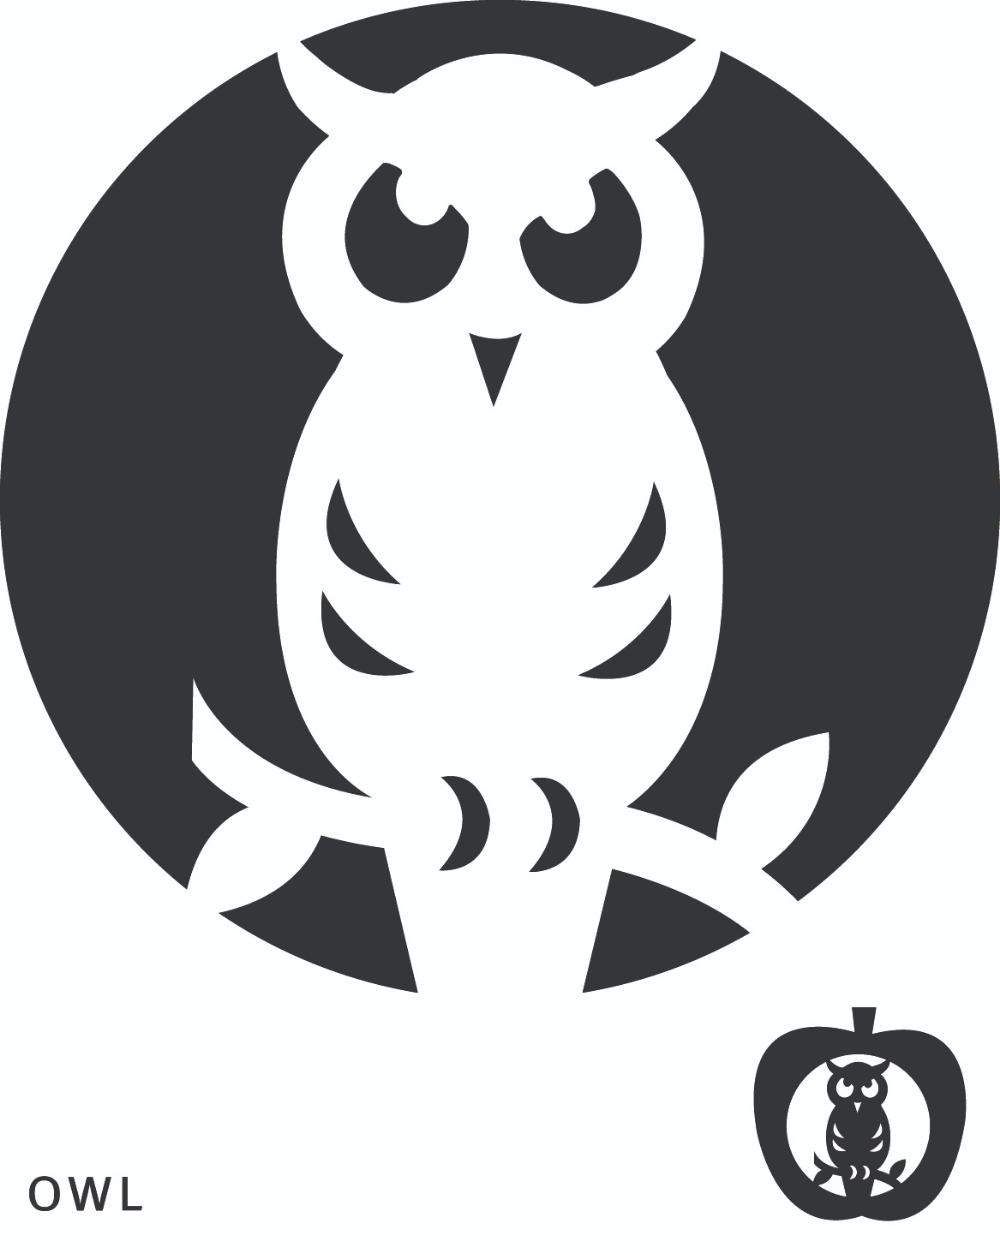 Printable Owl Pumpkin Carving Templates Owl Pumpkin Carving Pumpkin Carving Templates Owl Pumpkin